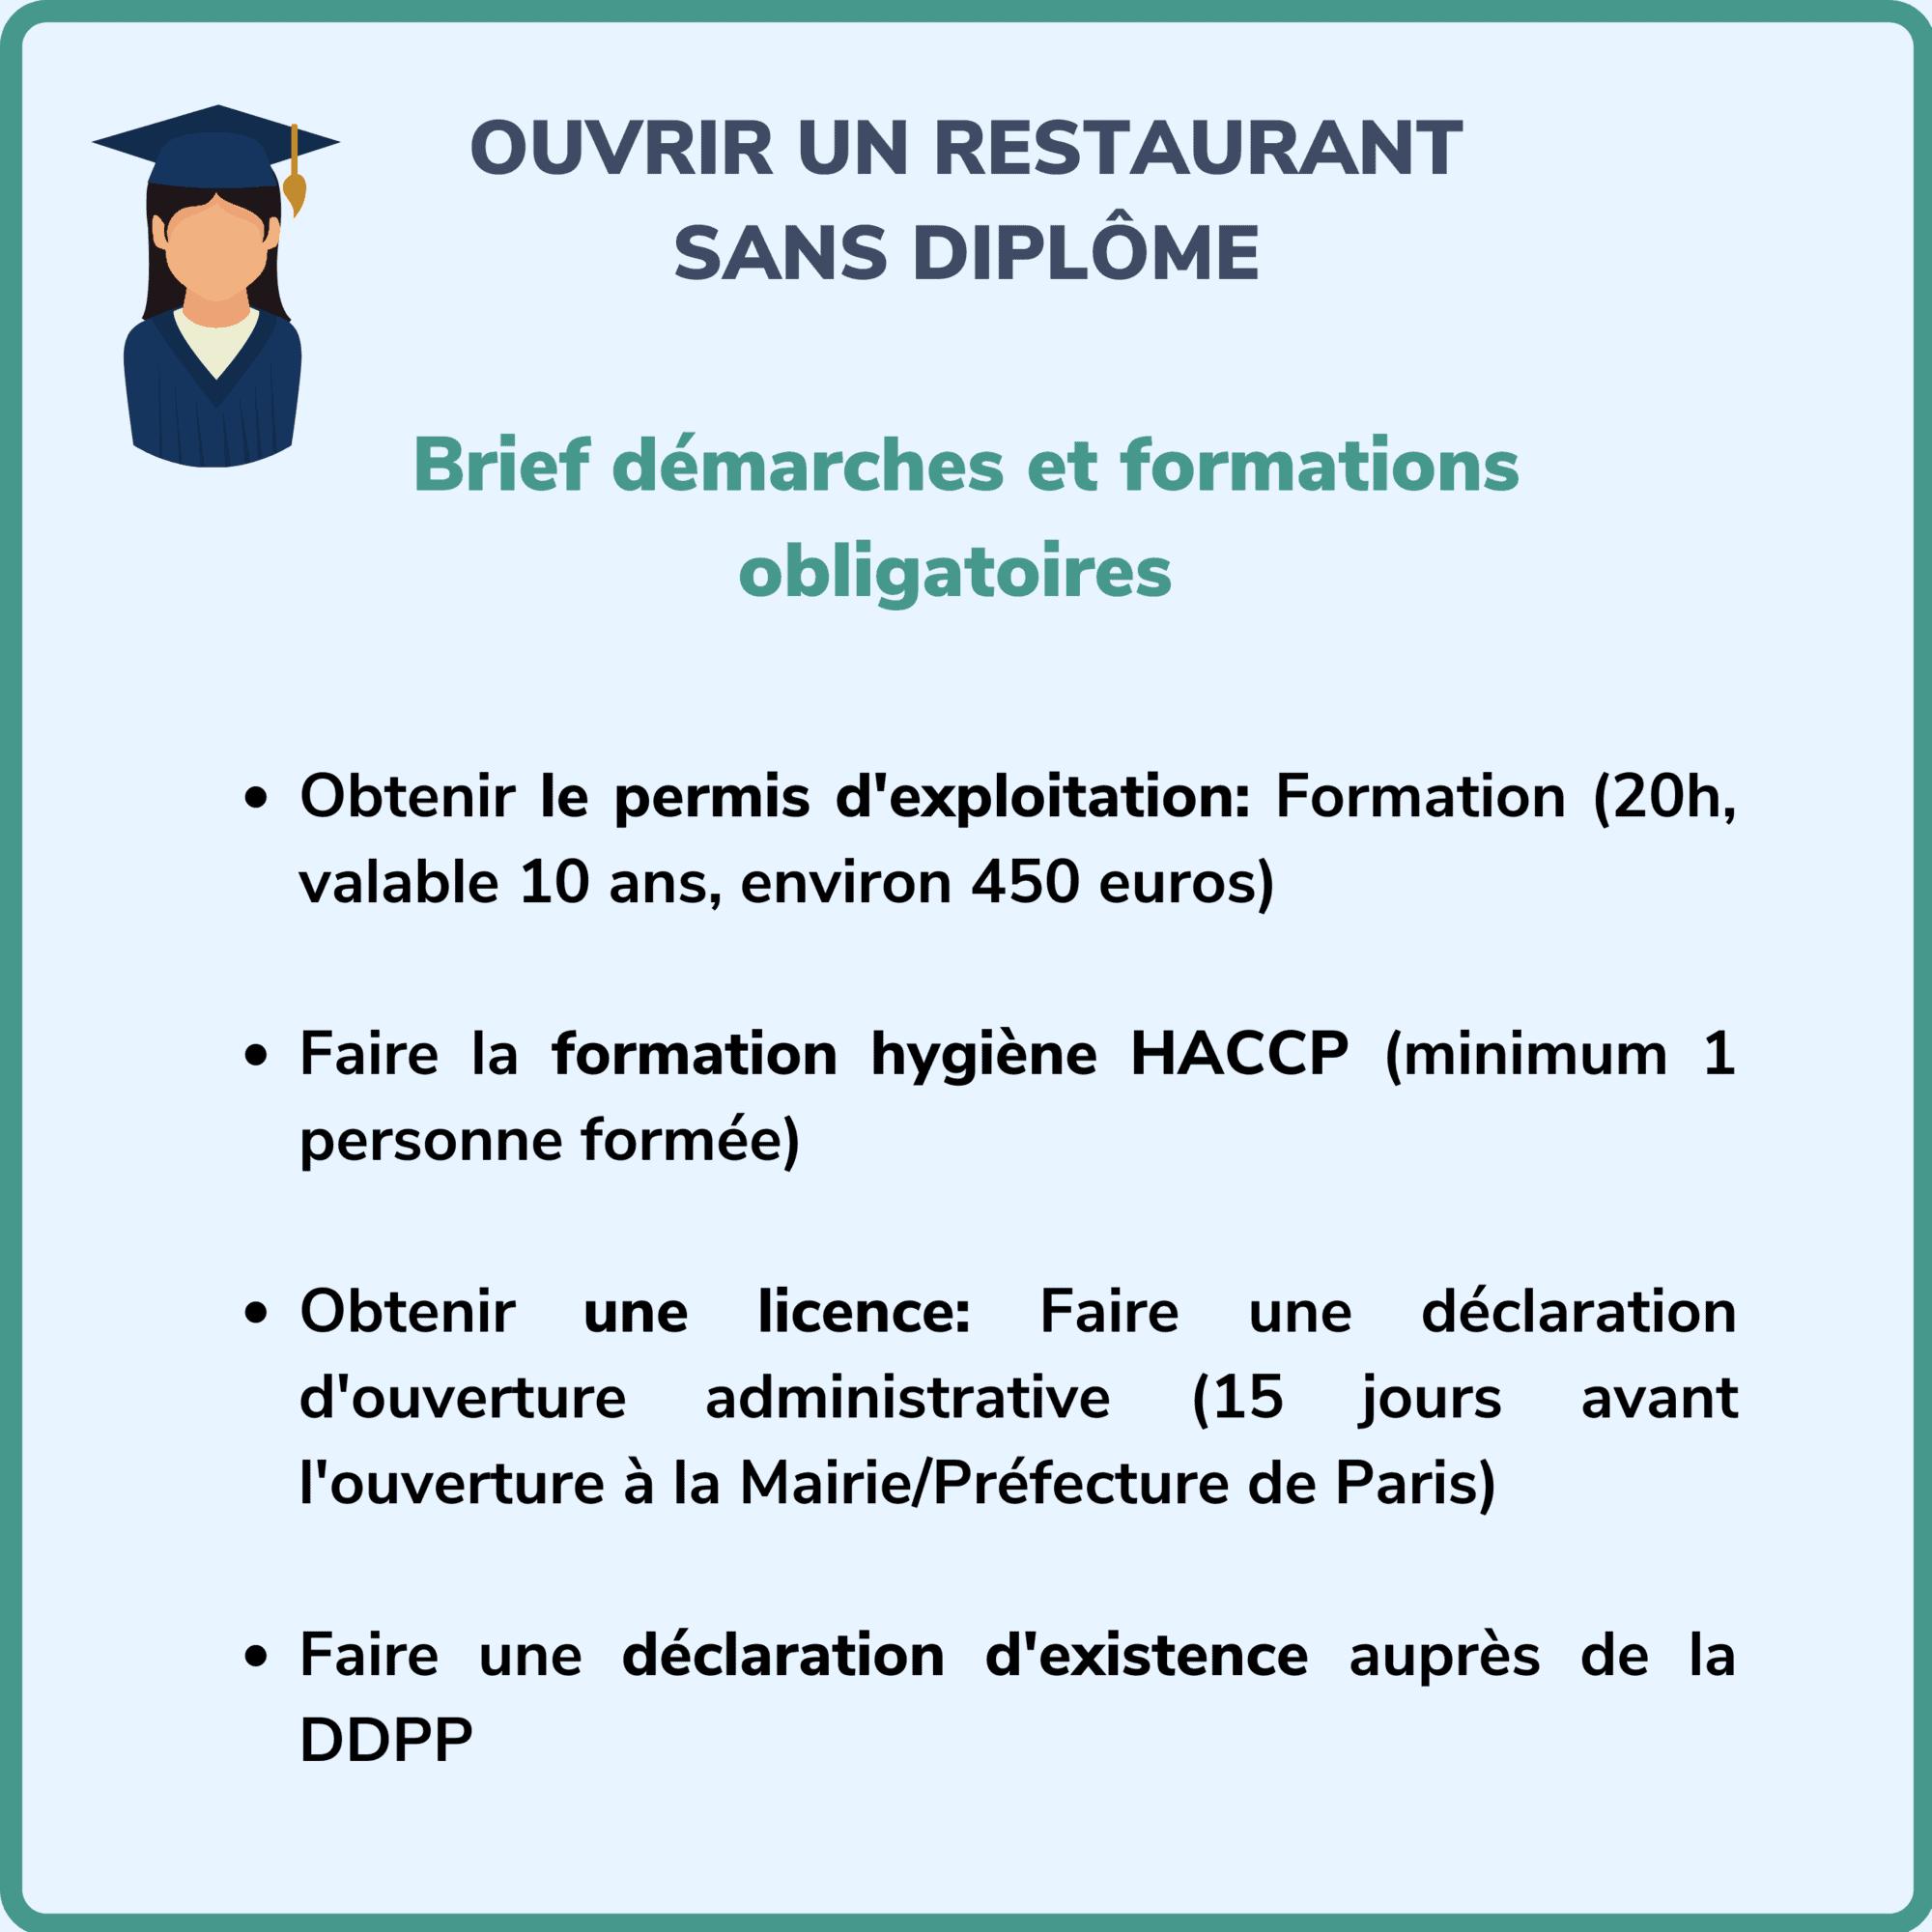 Ouvrir un restaurant sans diplôme